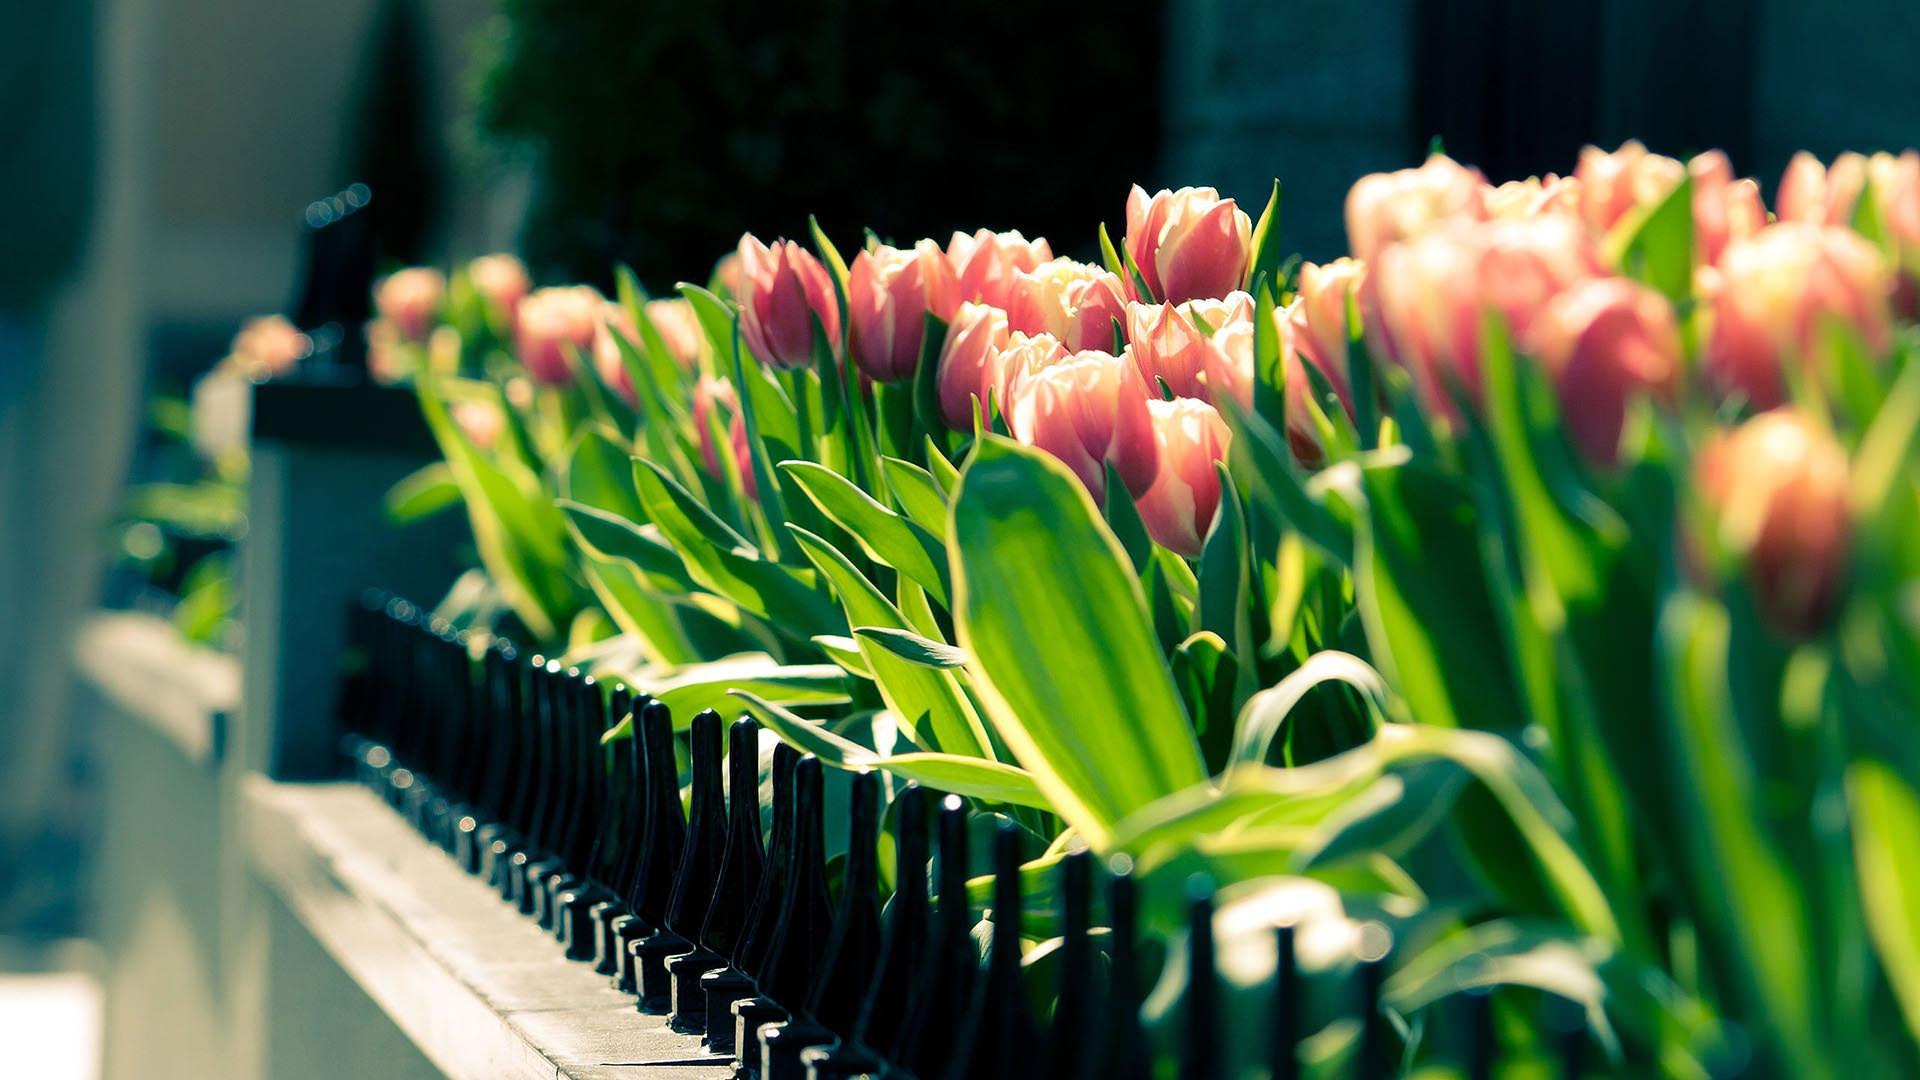 Best flower tulip wallpaper full HD